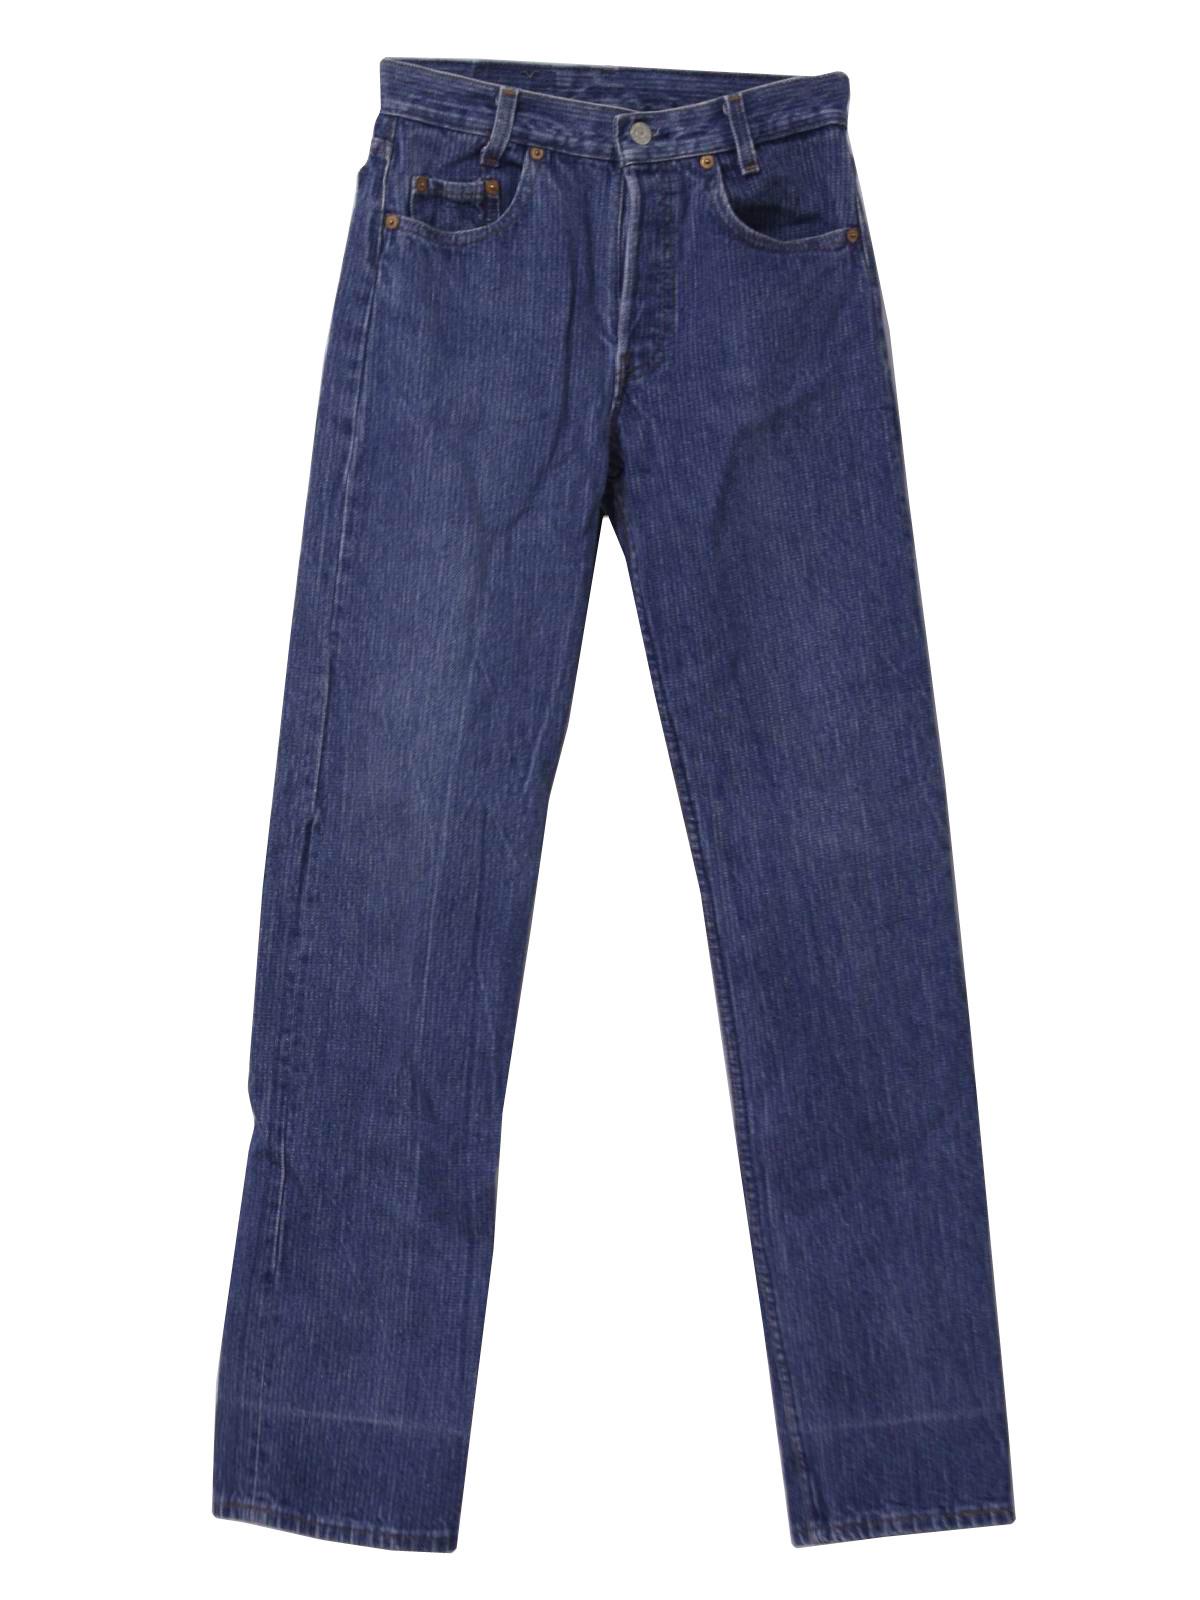 Vintage Levis 501 1990s Pants 90s -Levis 501- Womens shaded blue on blue background faint ...